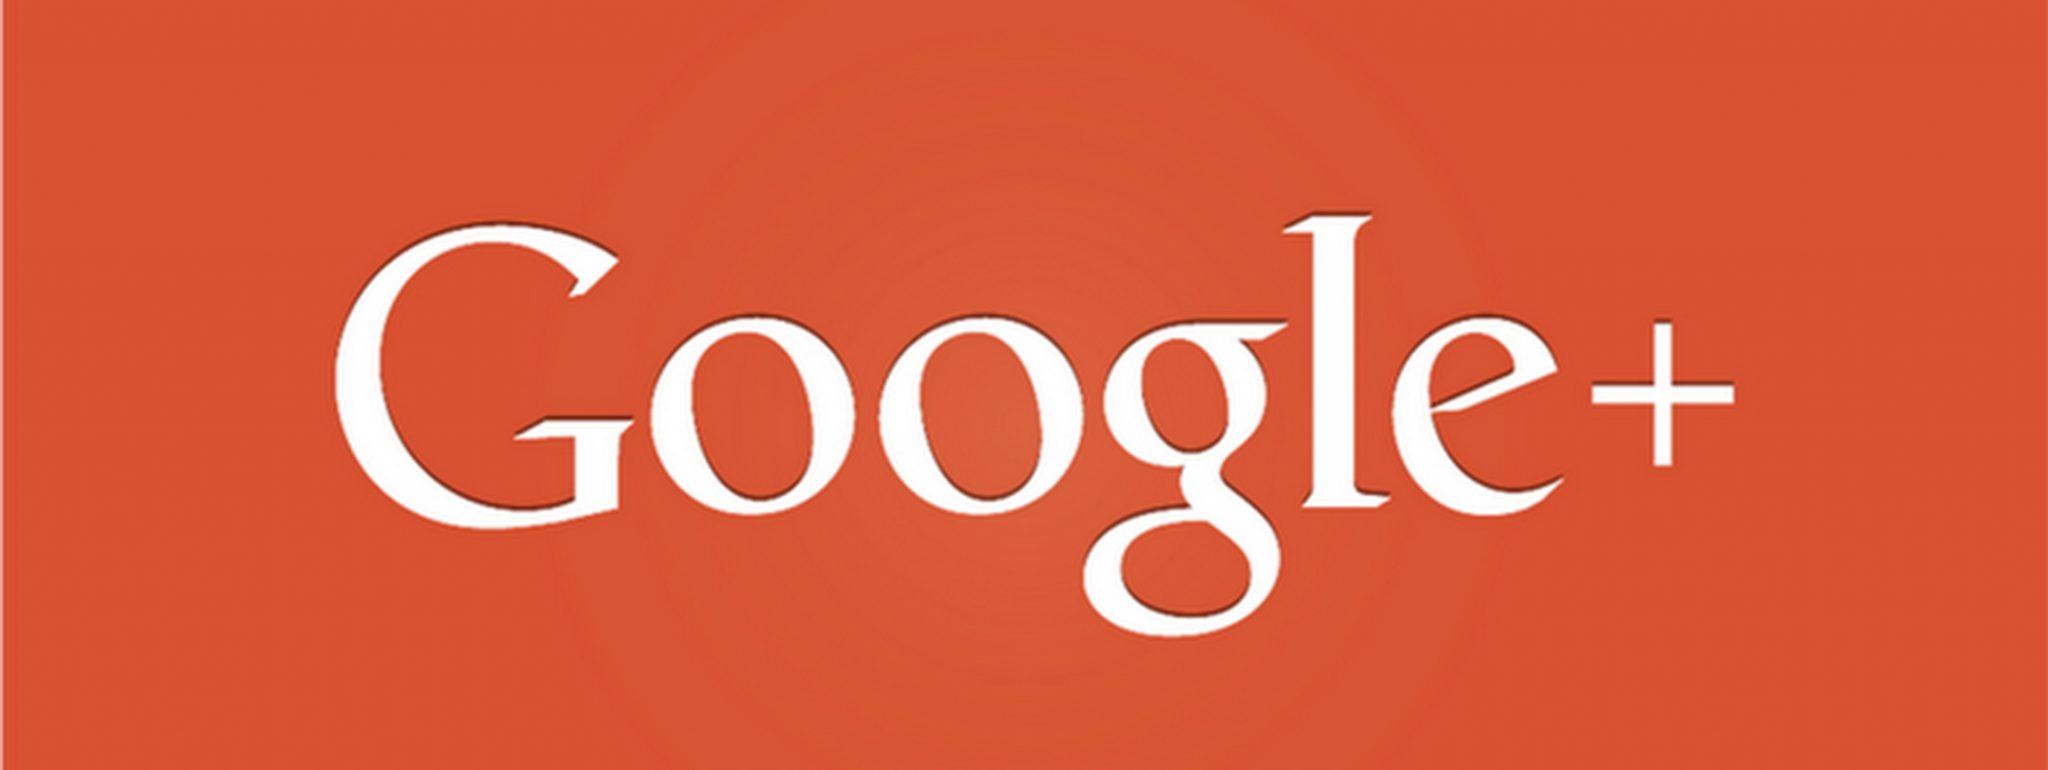 Google Plus Auto-Enhance Videos For Desktop And Smartphones